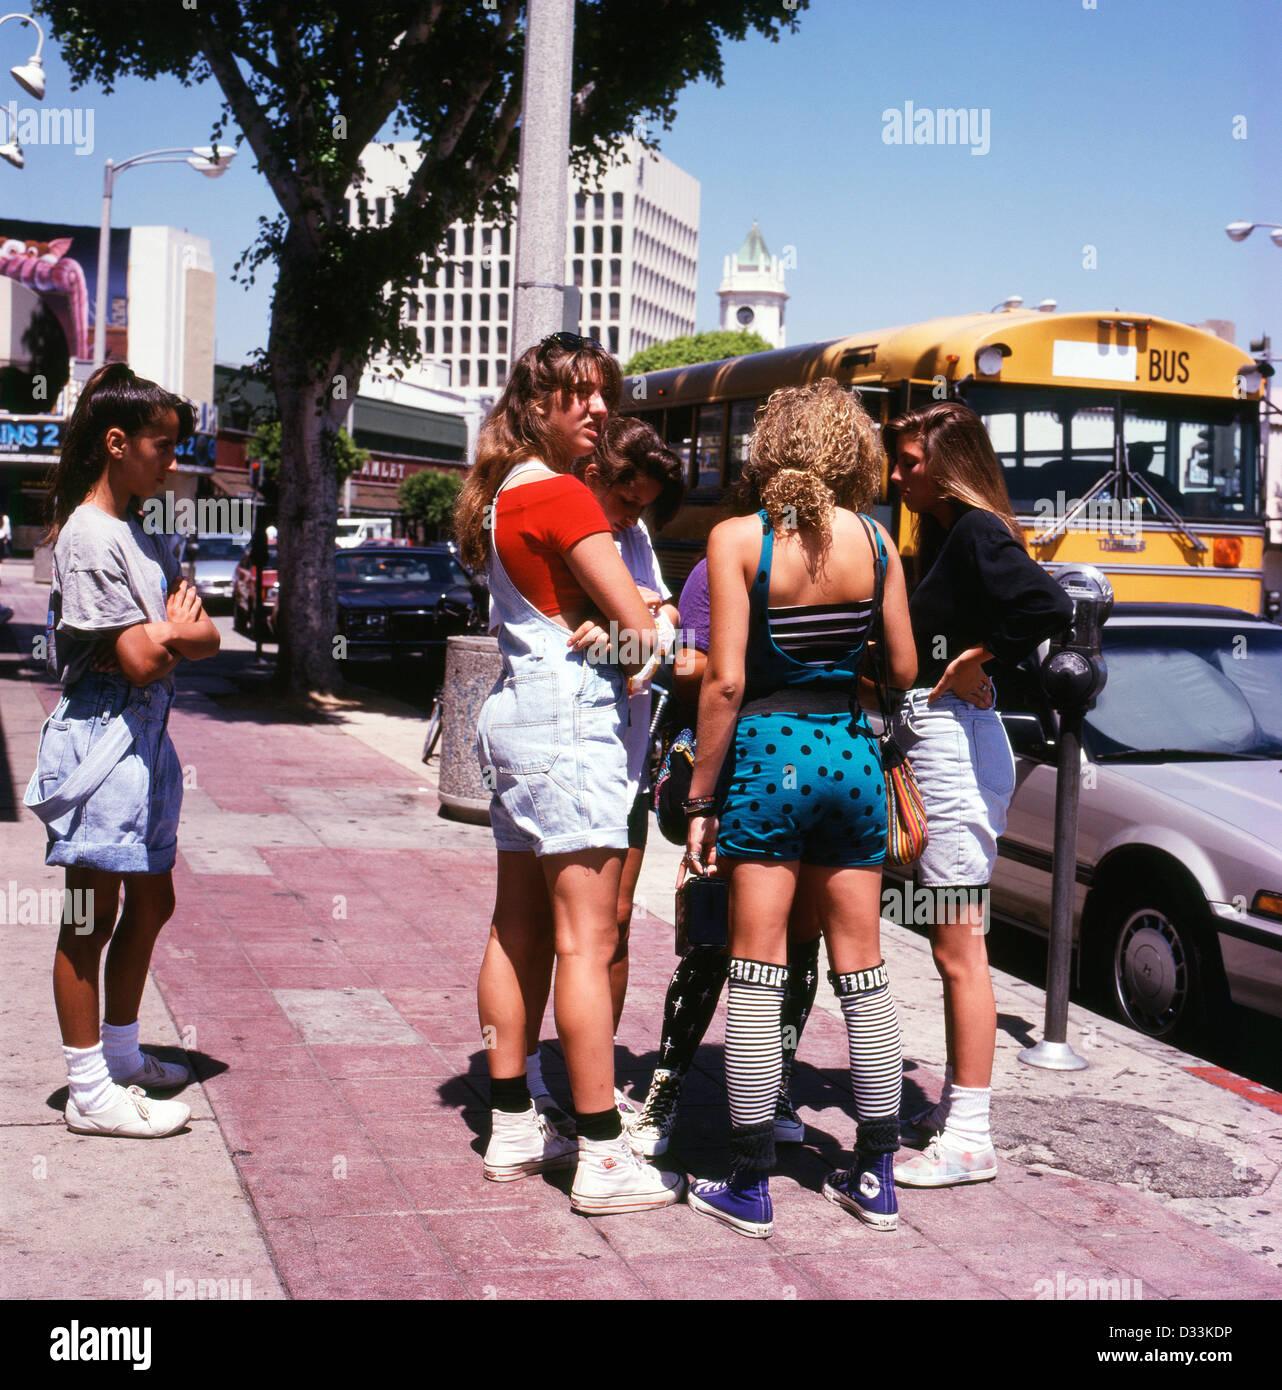 Sexaddicts teenagers los angeles